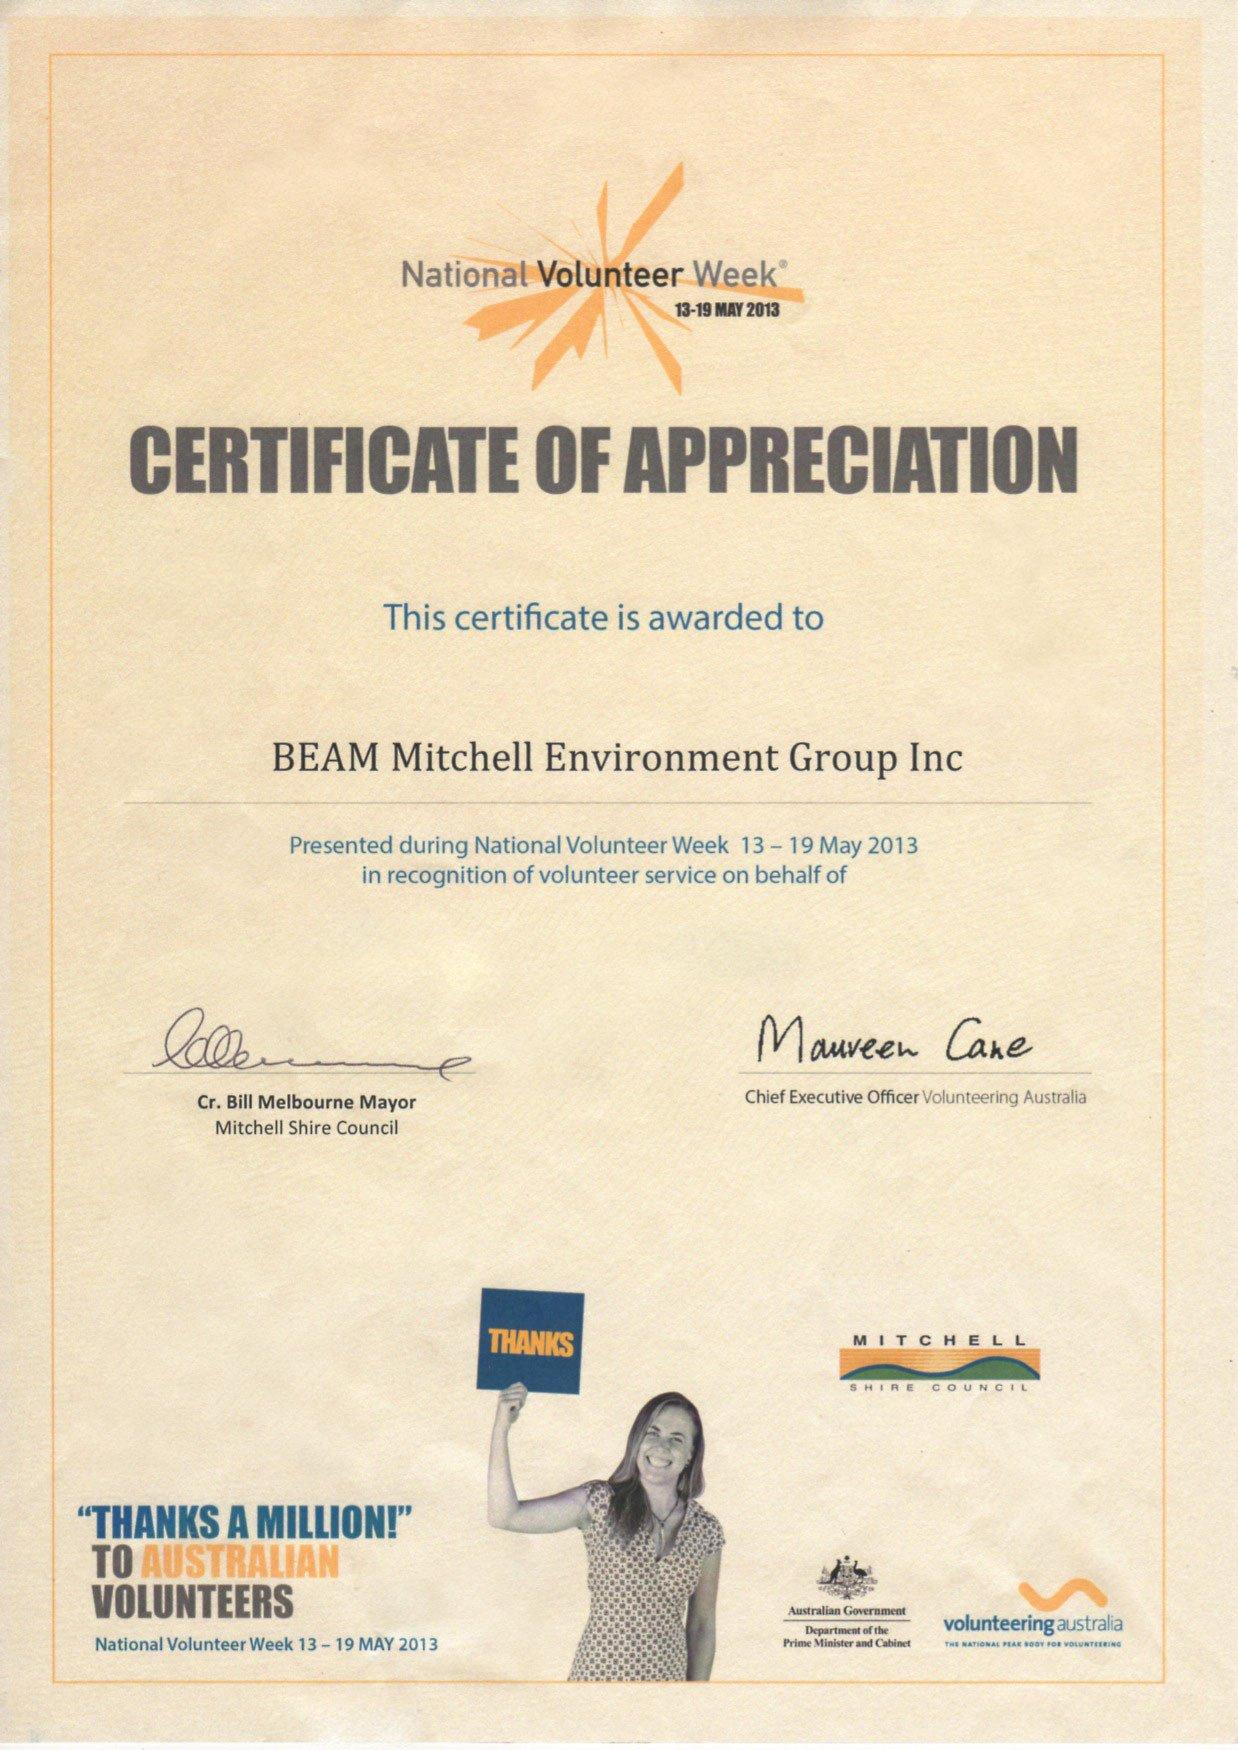 Volunteer Certificate Of Appreciation July 2013